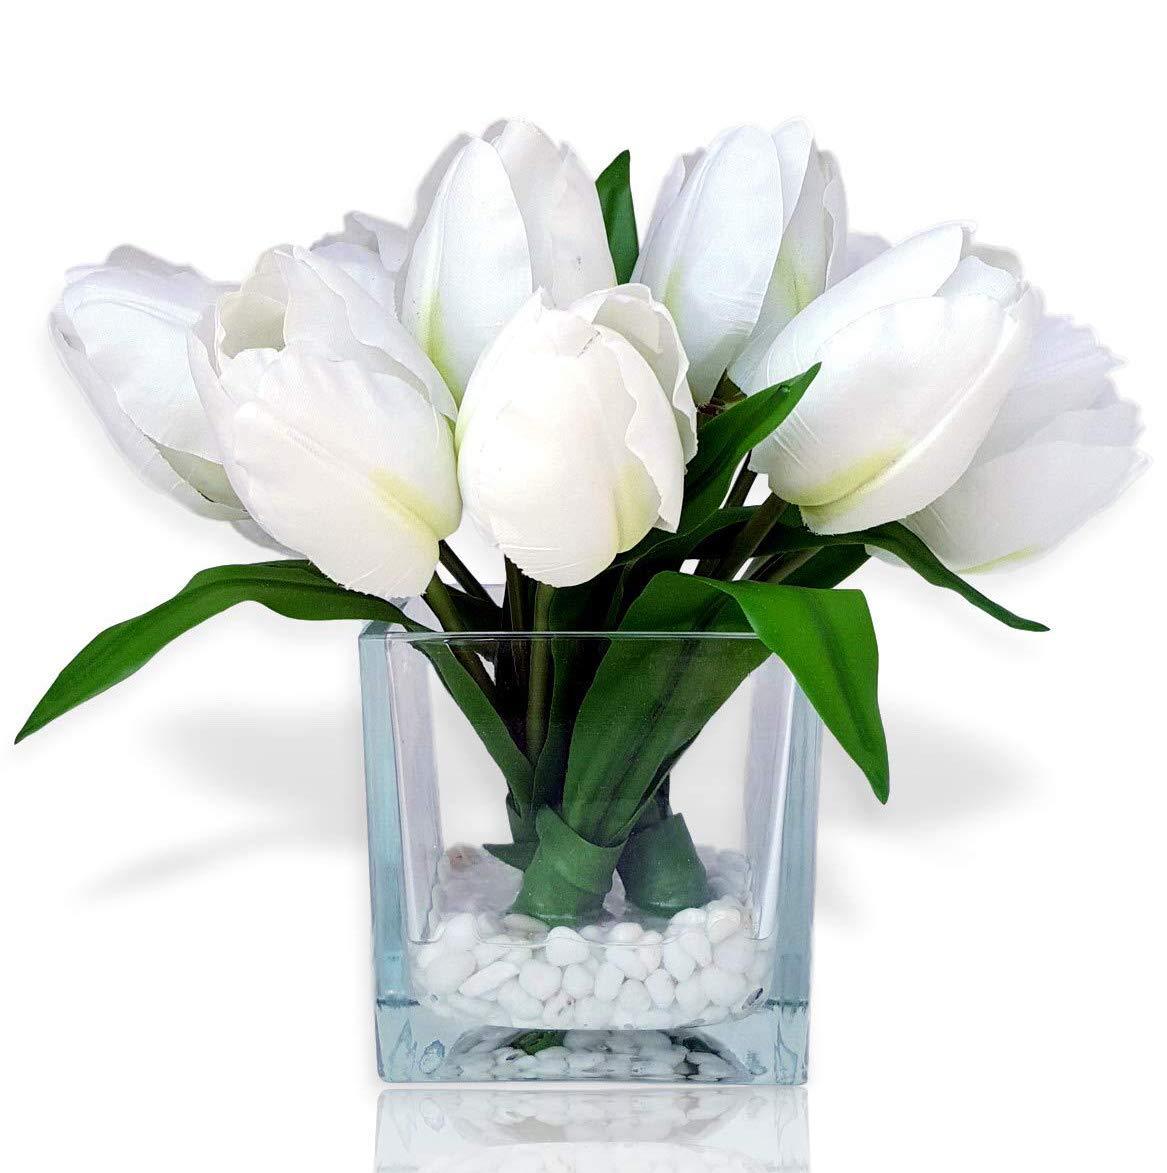 silk flower arrangements basik nature artificial flowers tulip floral arrangement in vase - fake flowers silk tulips centerpiece - modern artificial silk flowers for decoration (white)